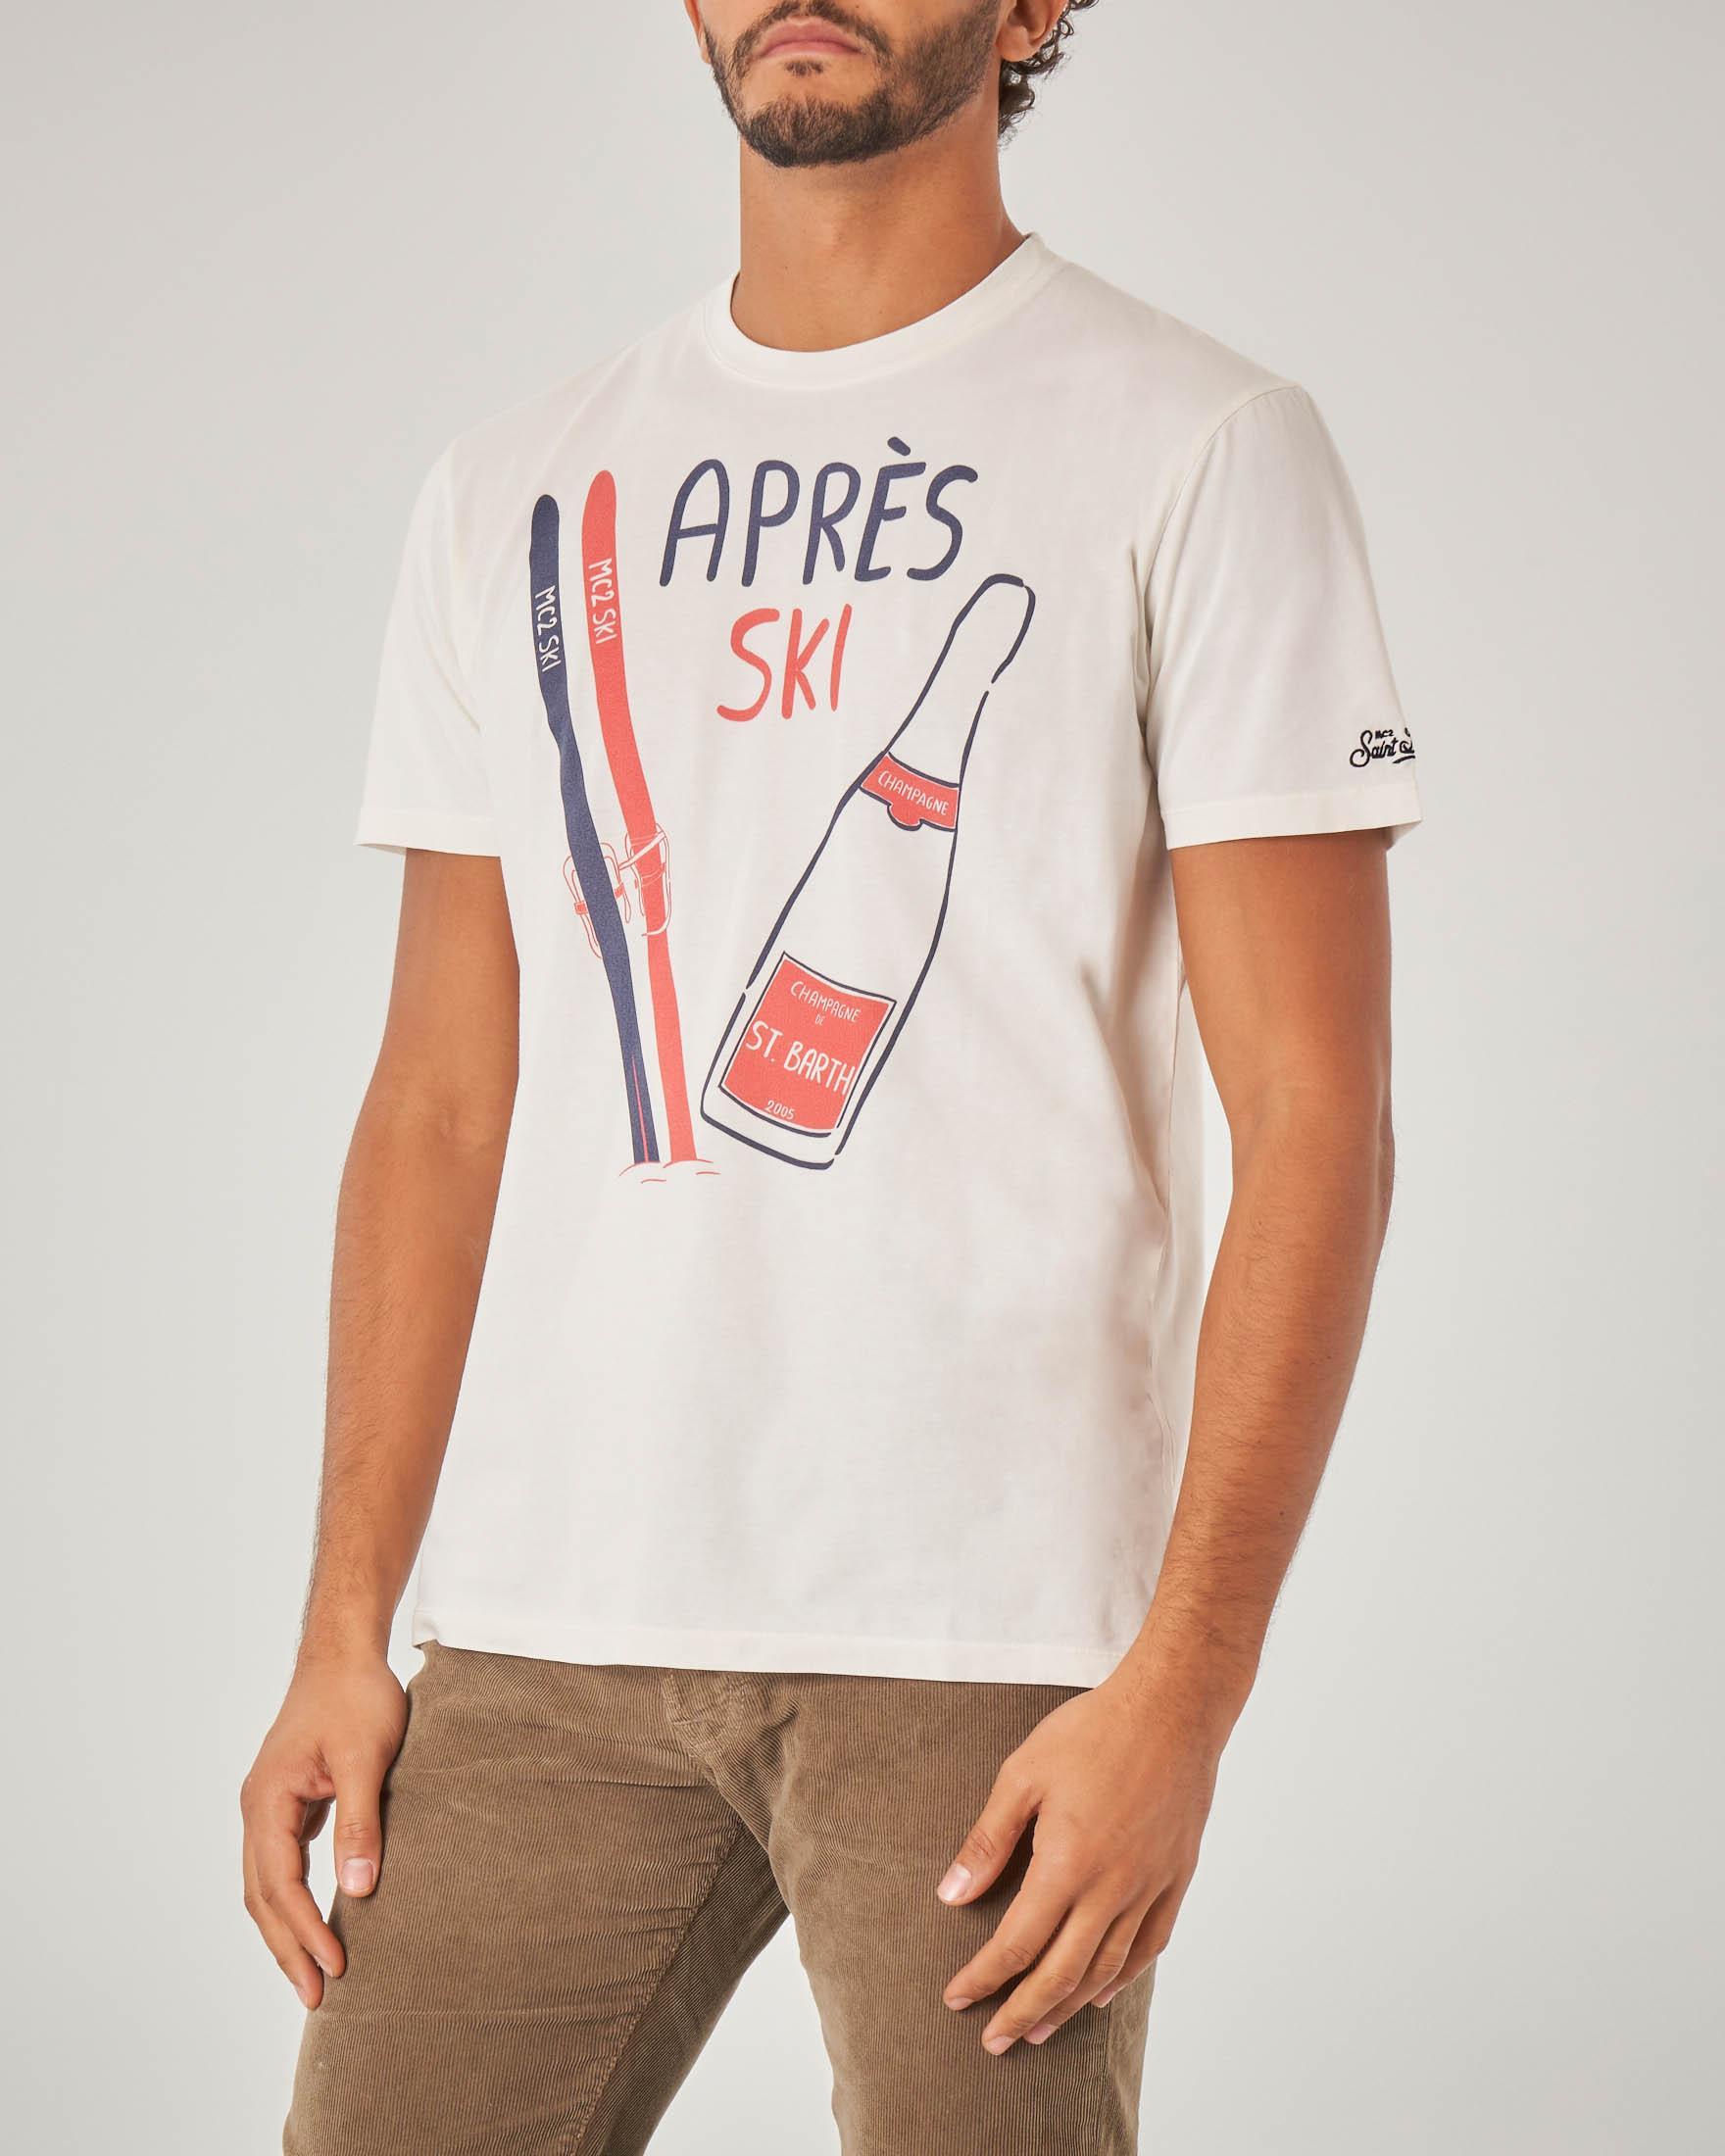 T-shirt bianca mezza manica con scritta Après Ski e stampa